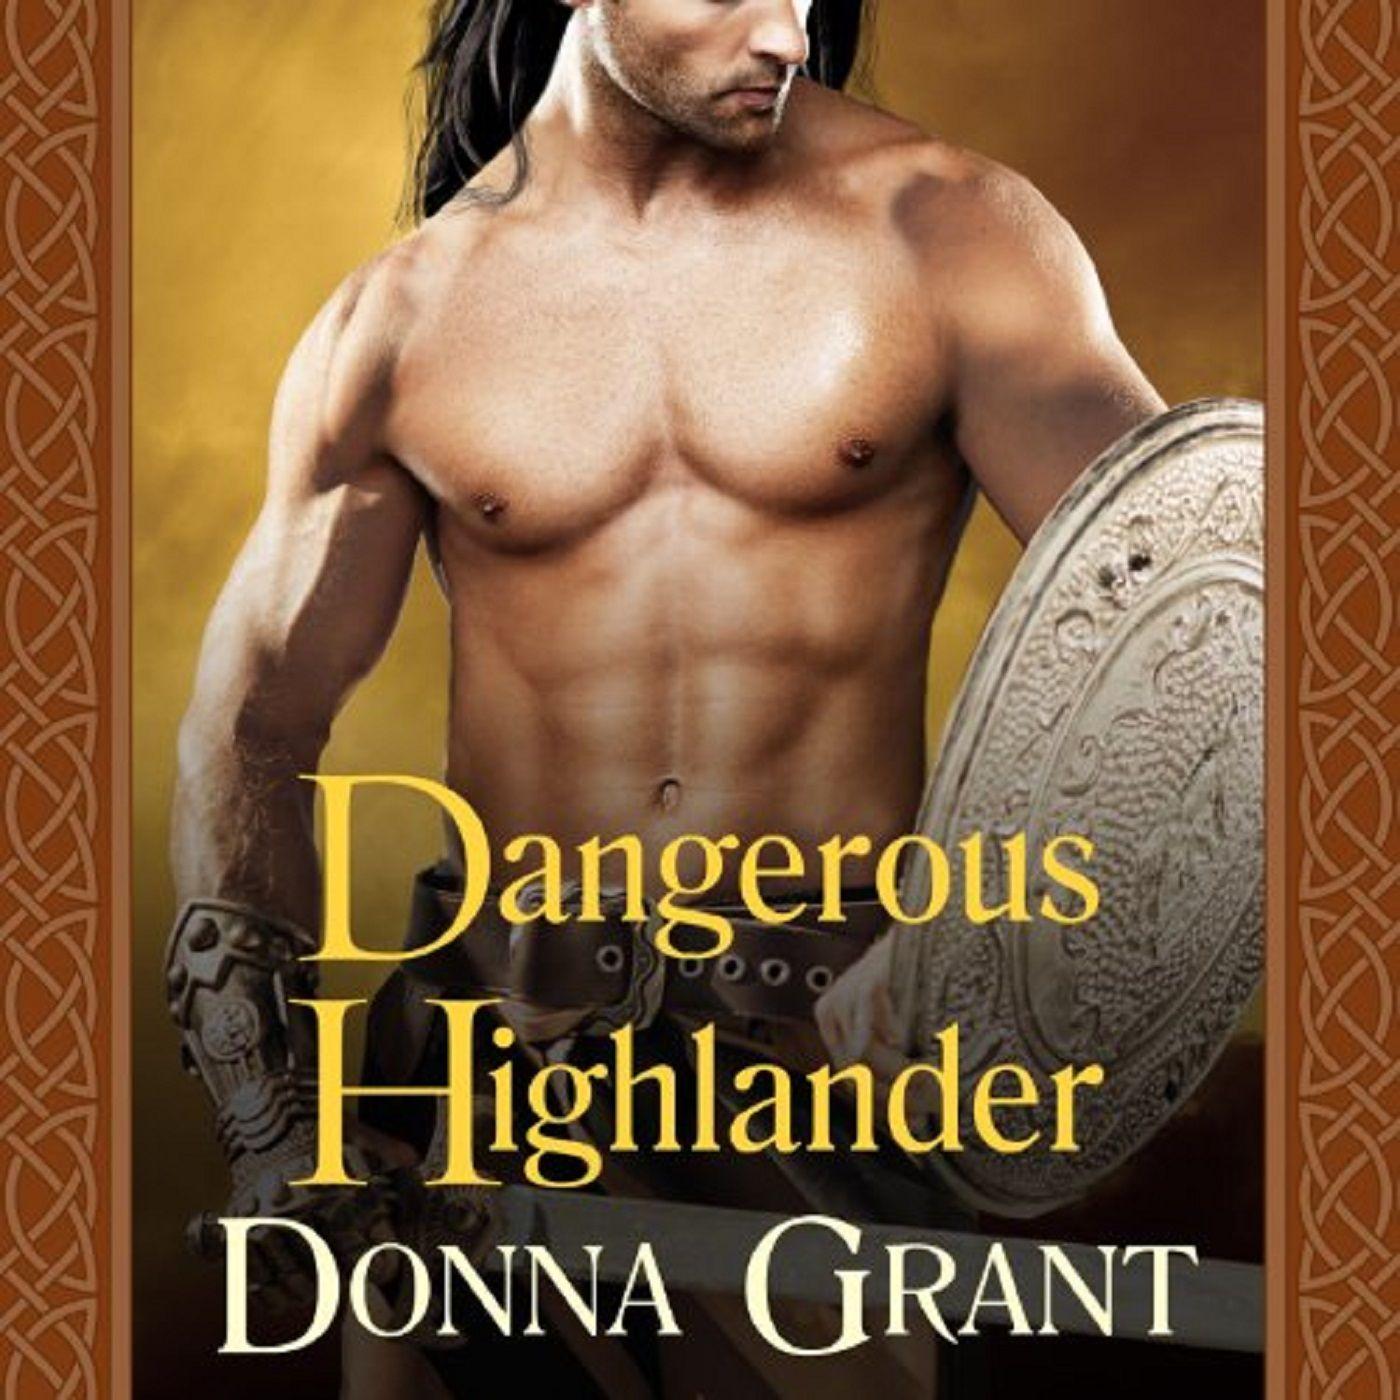 Dangerous Highlander by Donna Grant ch2